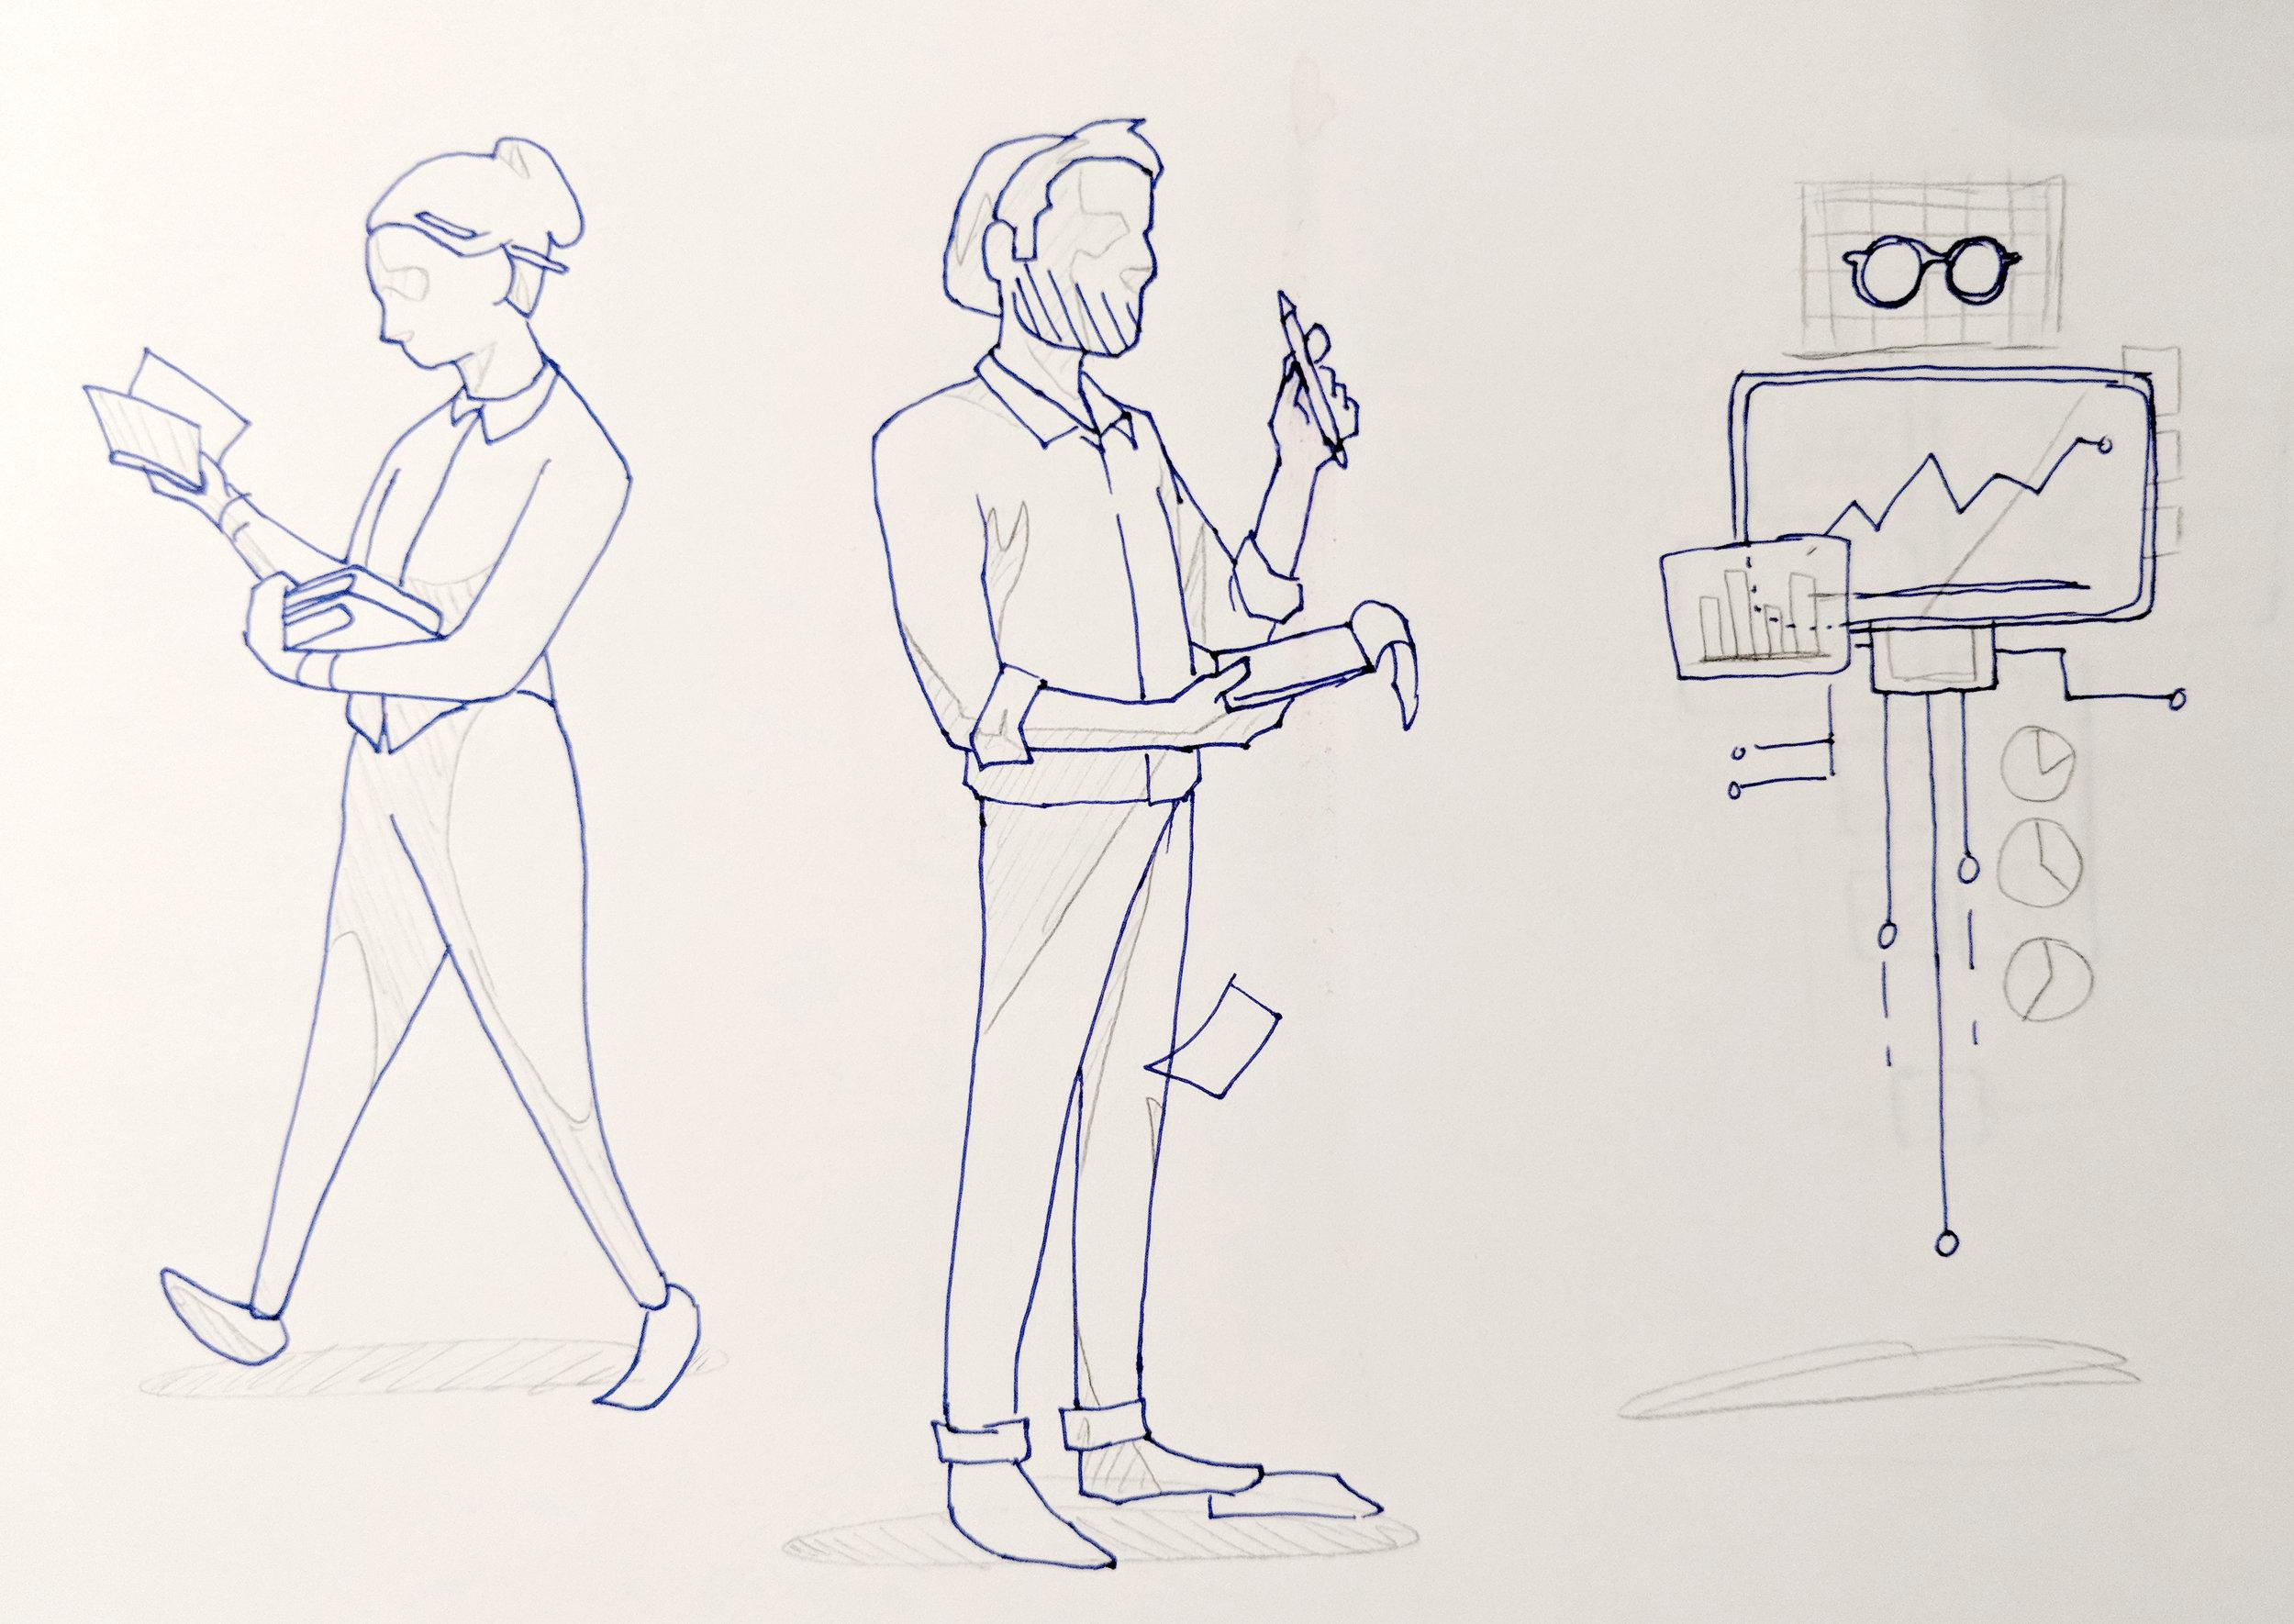 trio sketch.jpg